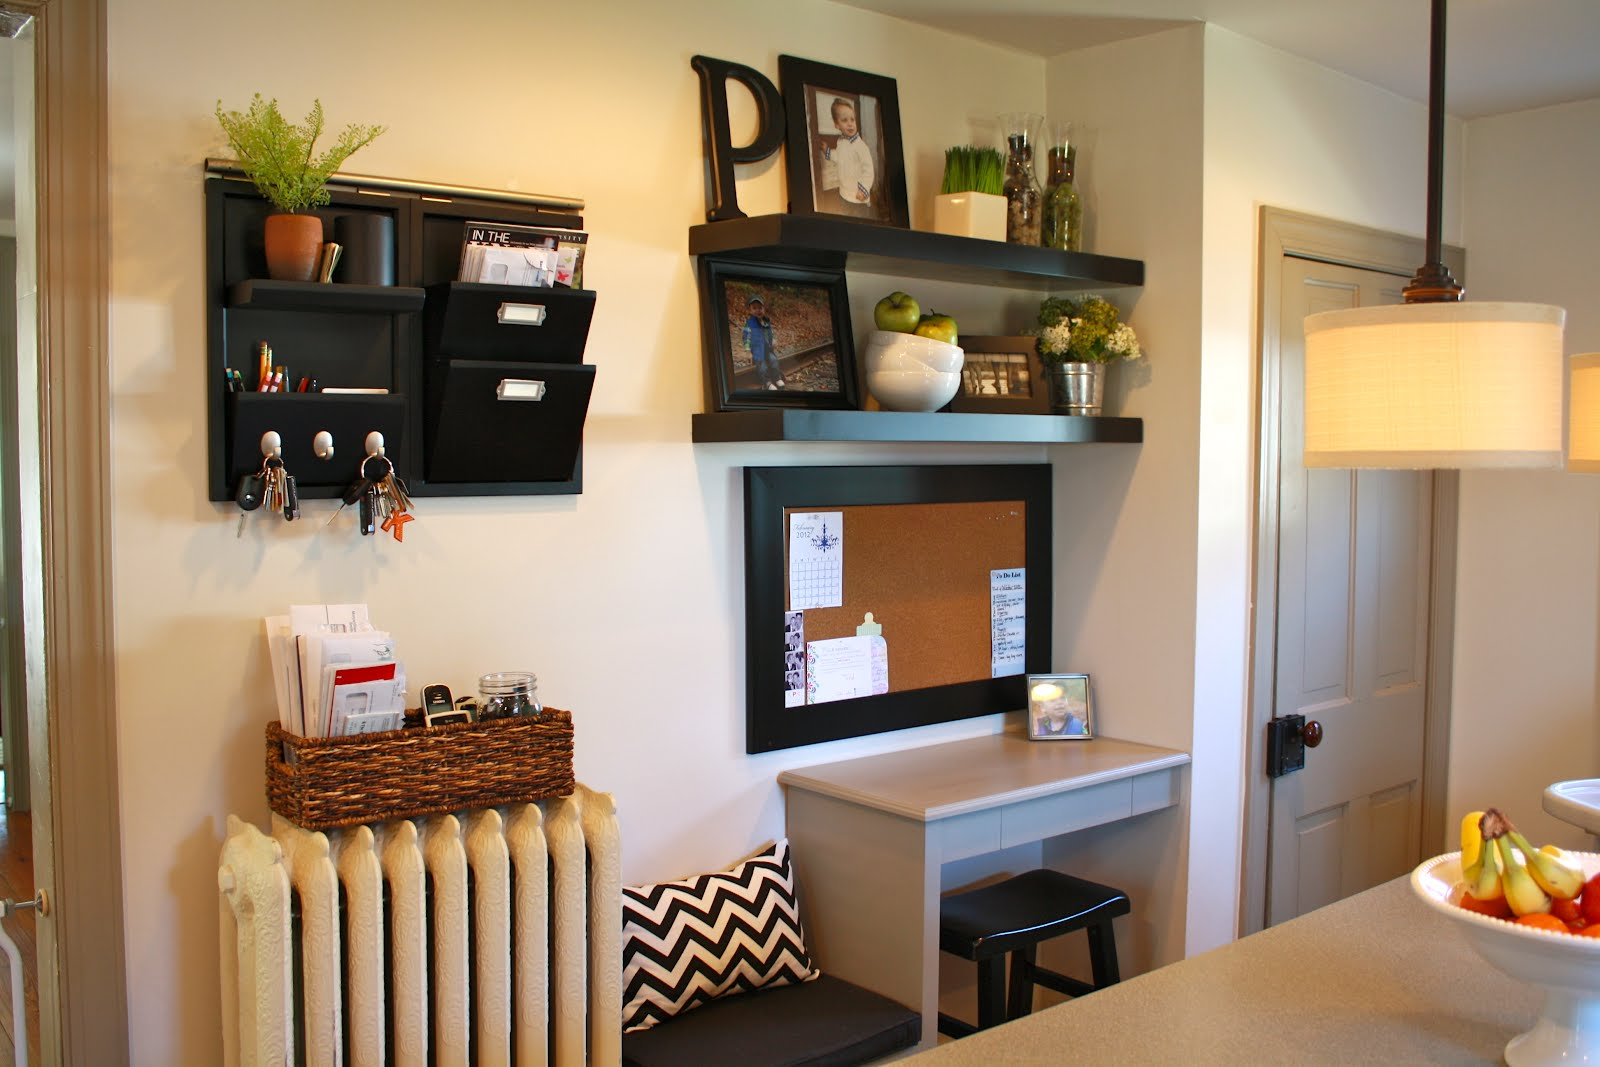 Studio lime design home improvements kitchen message center for Kitchen drop zone ideas